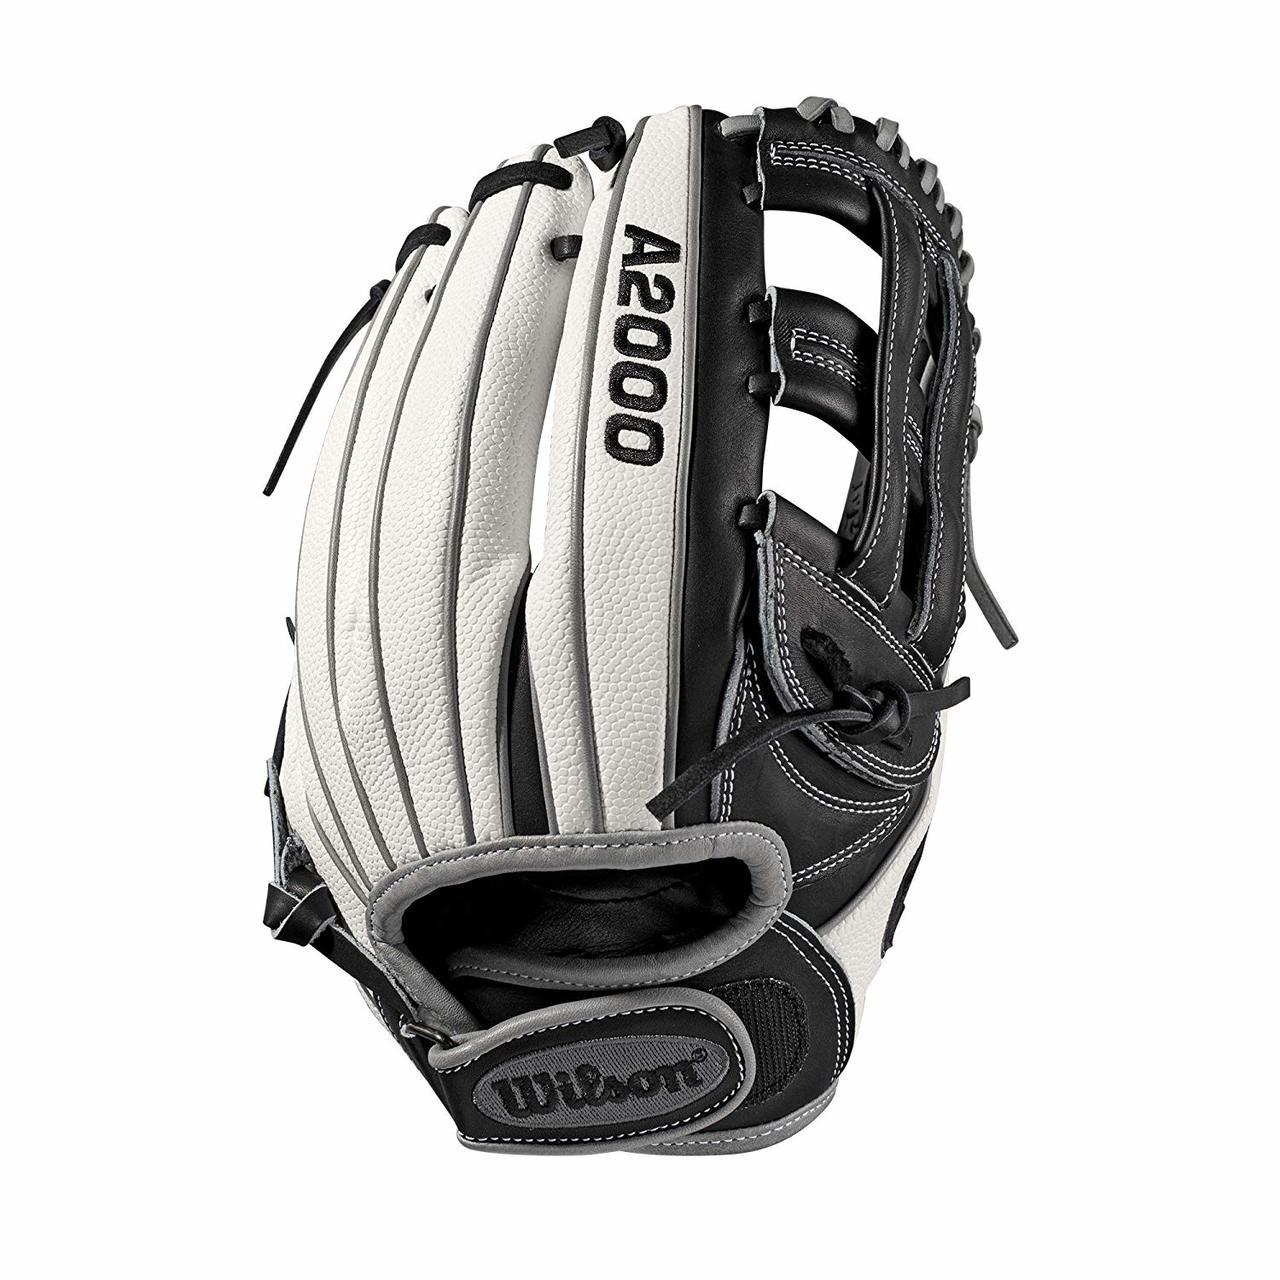 wilson-a2000-fastpitch-softball-glove-12-dual-post-web-right-hand-throw WTA20RF19FP12SS-RightHandThrow Wilson 887768702120 Infield/Pitcher model; dual post web; fast pitch-specific WTA20RF19FP12SS Comfort Velcro wrist